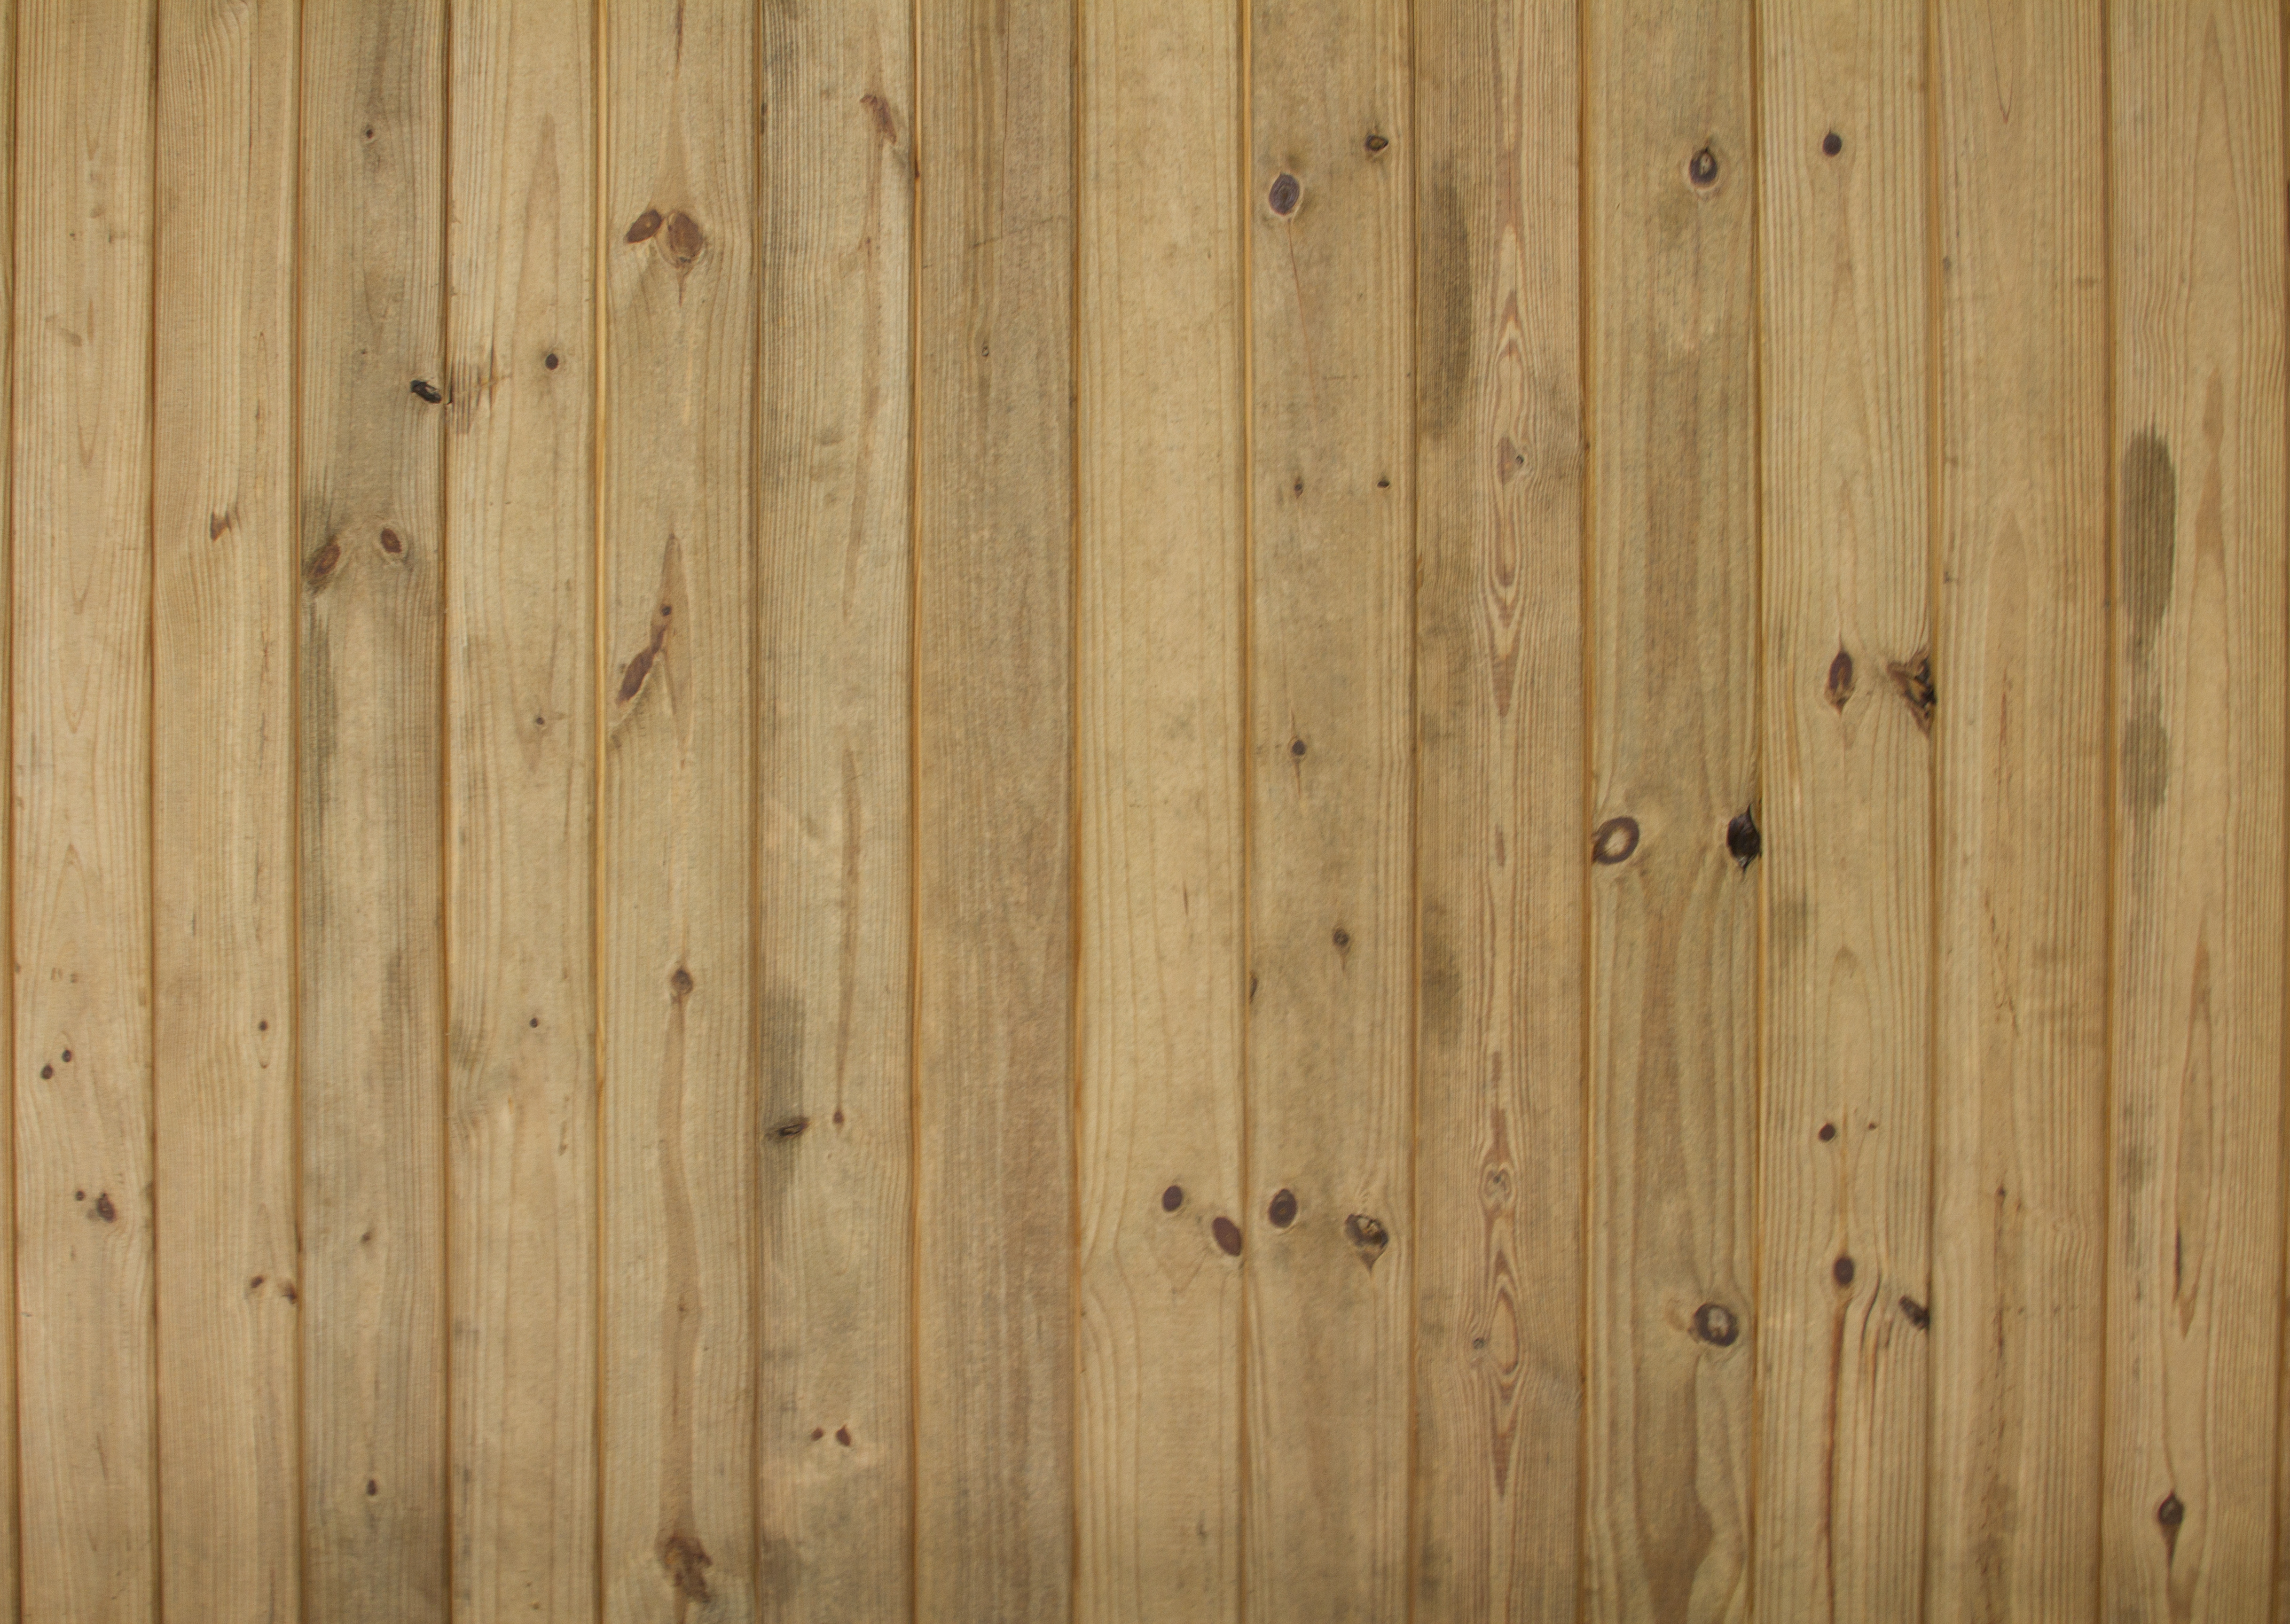 Natural Wood Panels Texture - 14Textures